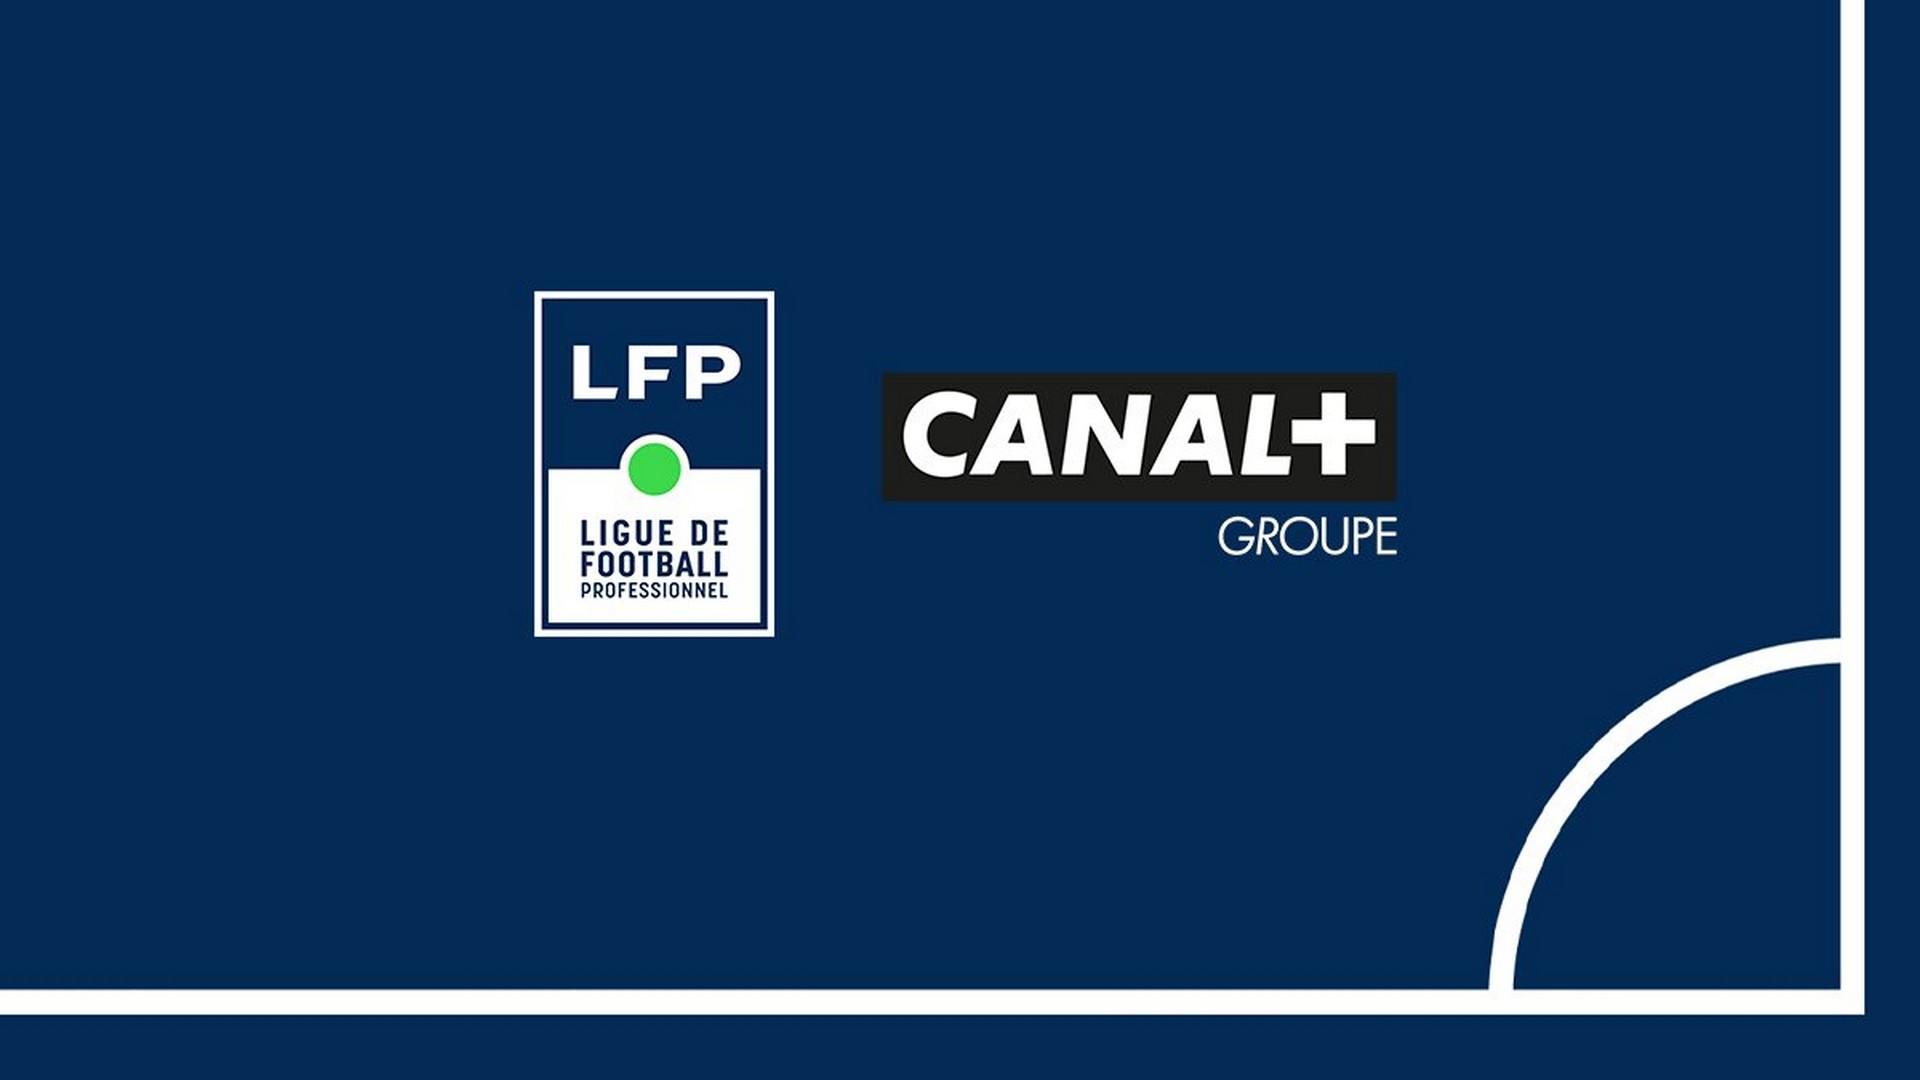 Canal+ x LFP (football) 2021